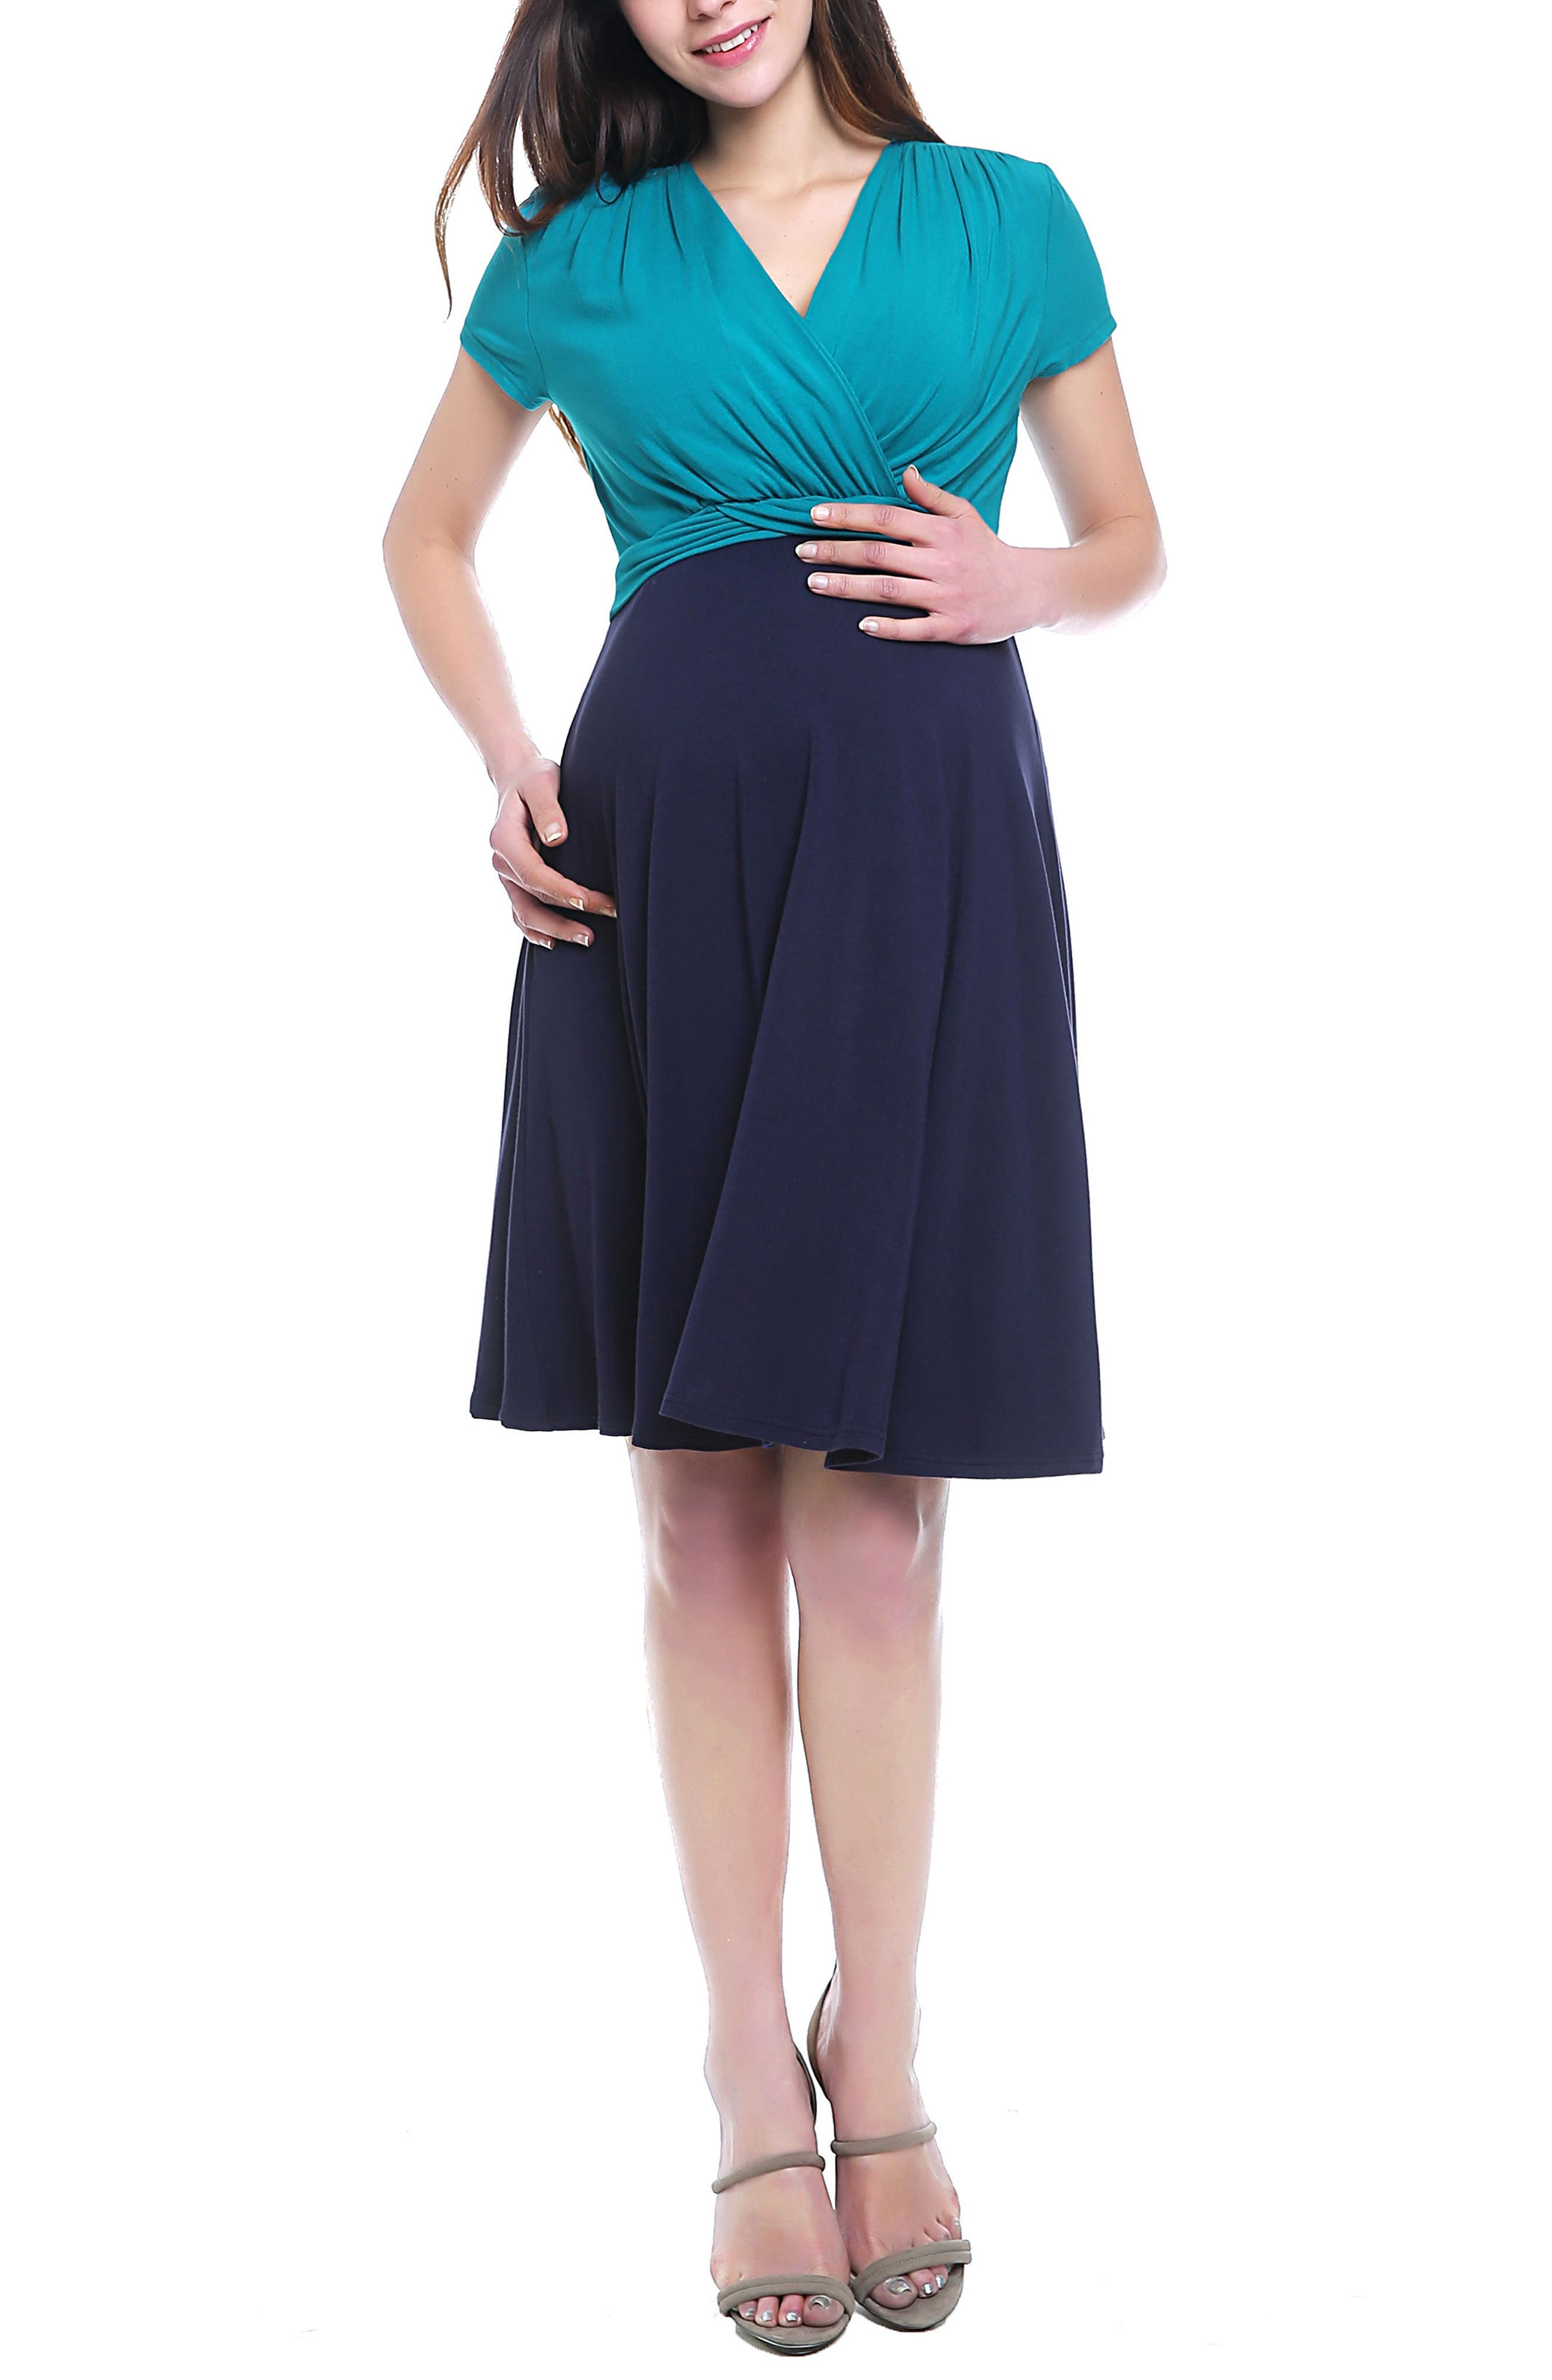 Alternate Image 1 Selected - Kimi & Kai Sarah Faux Wrap Maternity/Nursing Dress